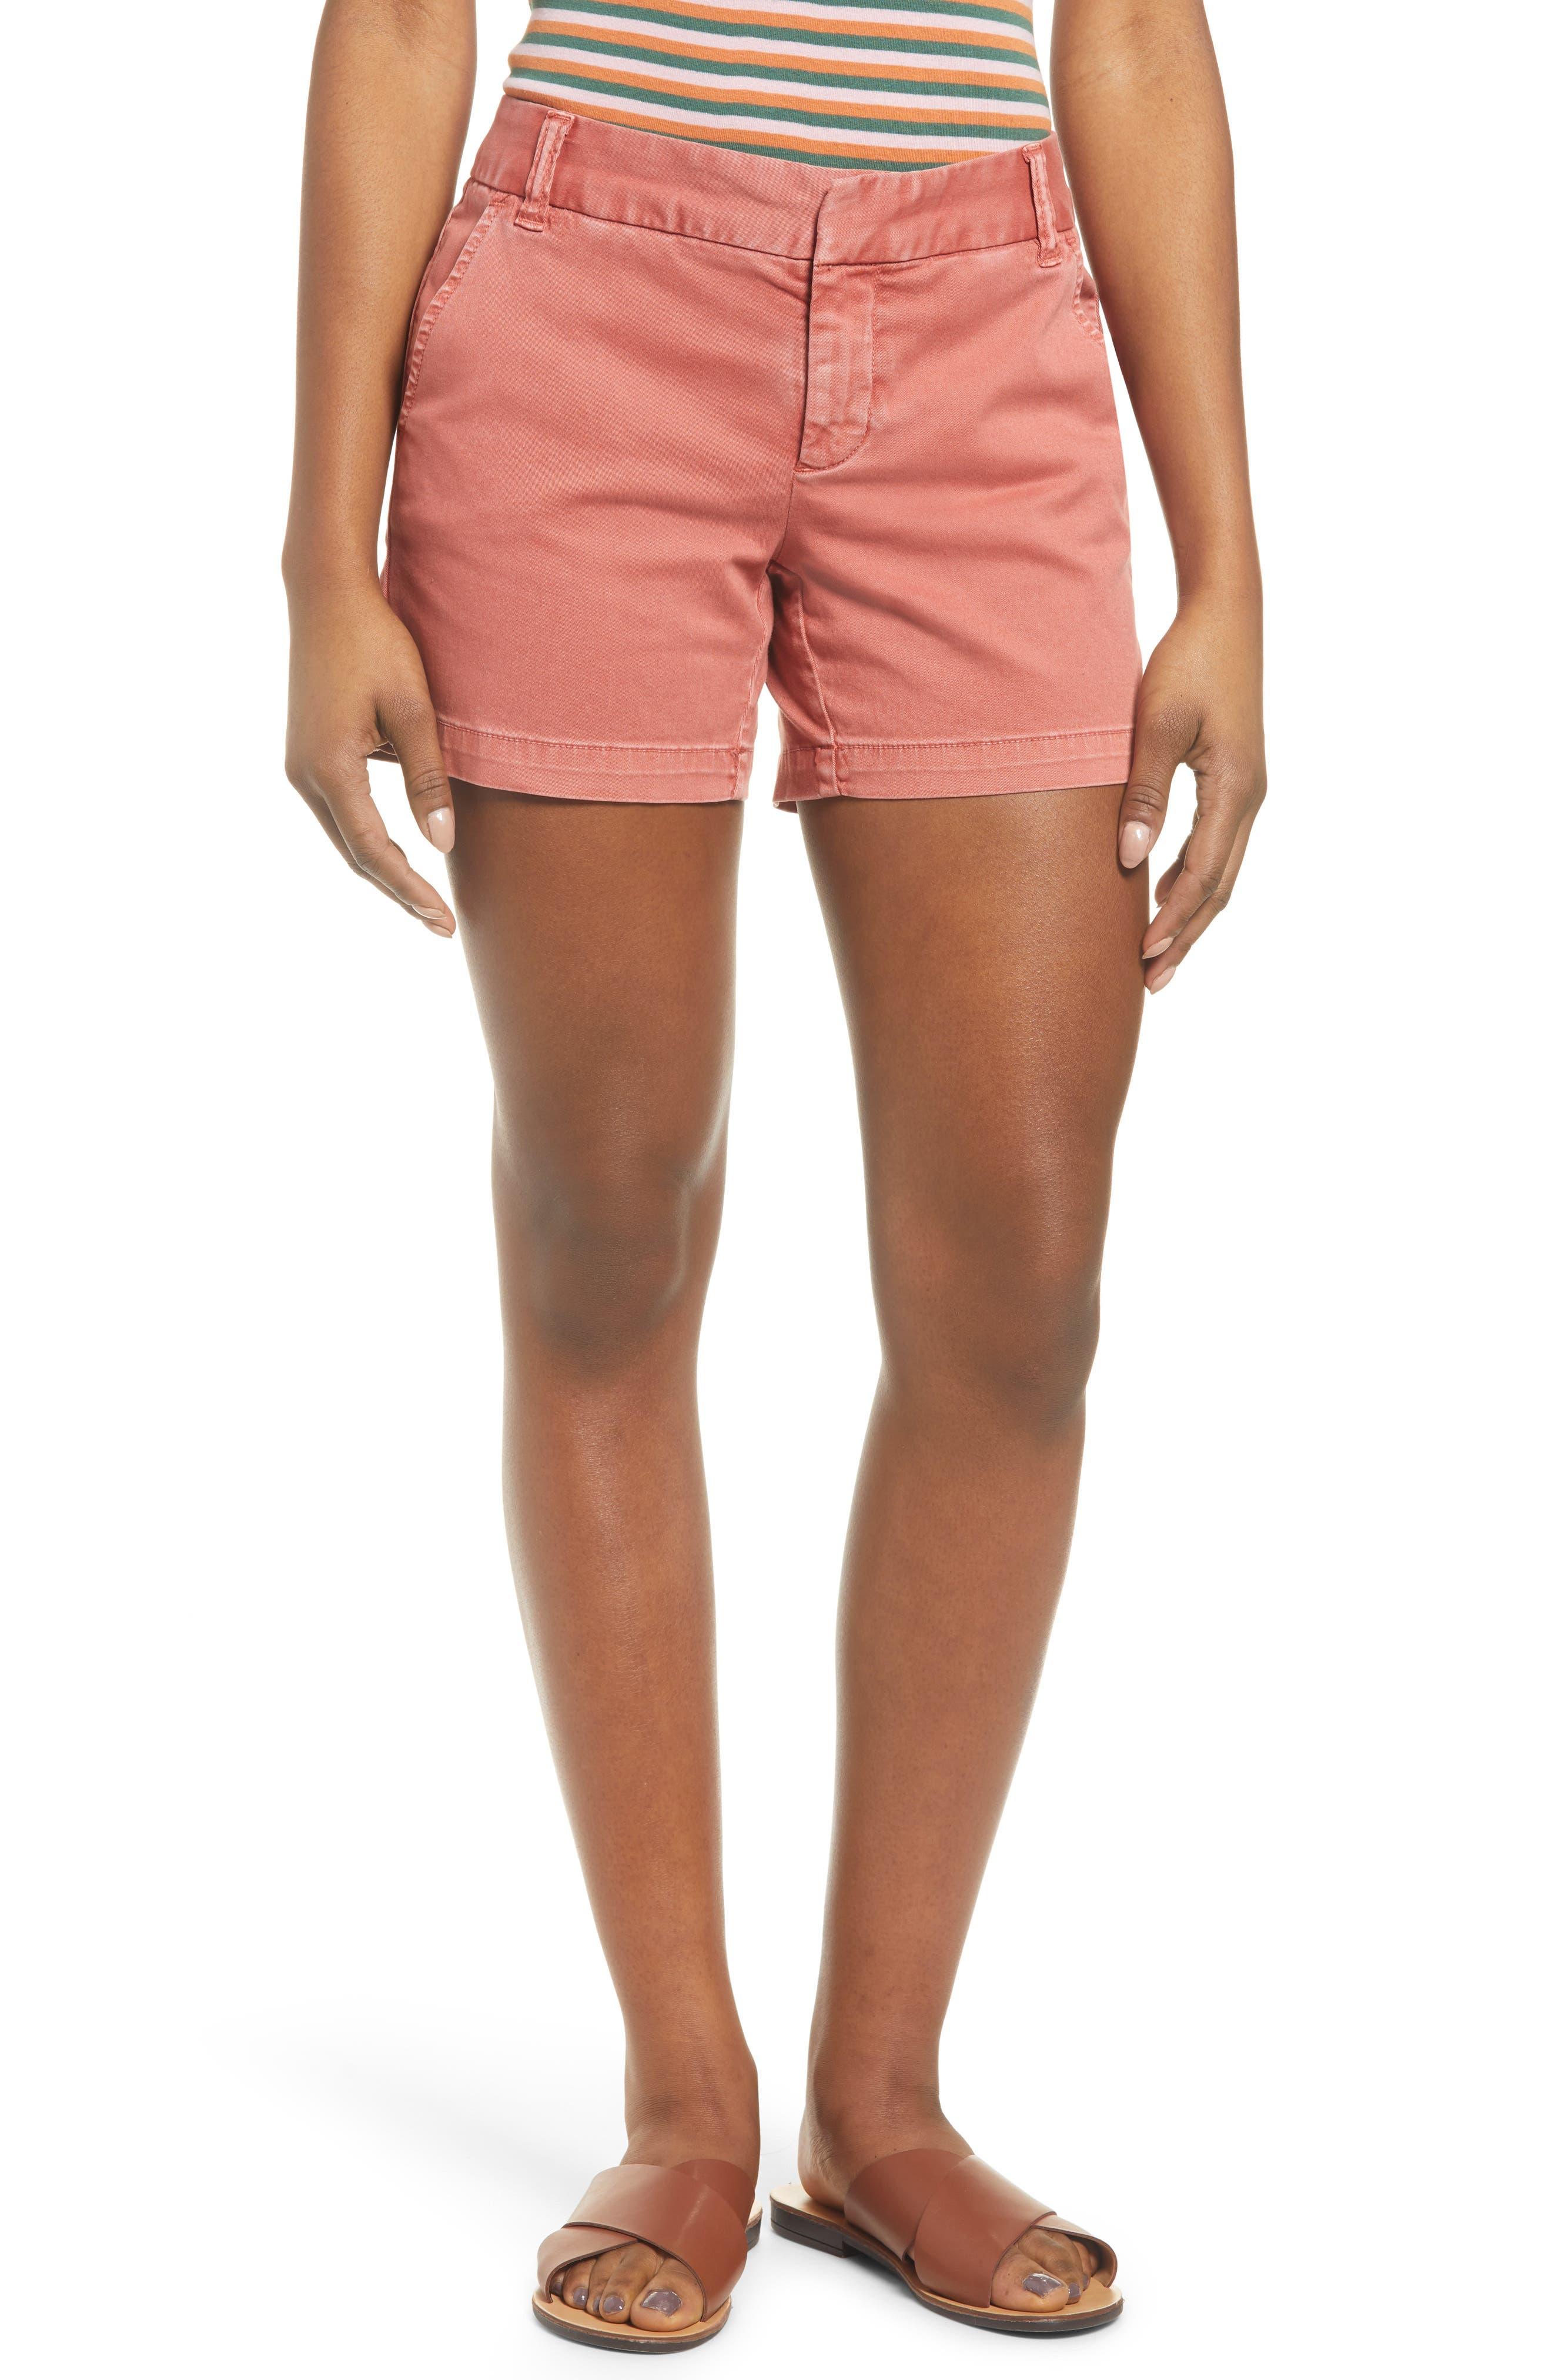 CaslonR Women's Caslon Cotton Twill Shorts,  18 - Pink